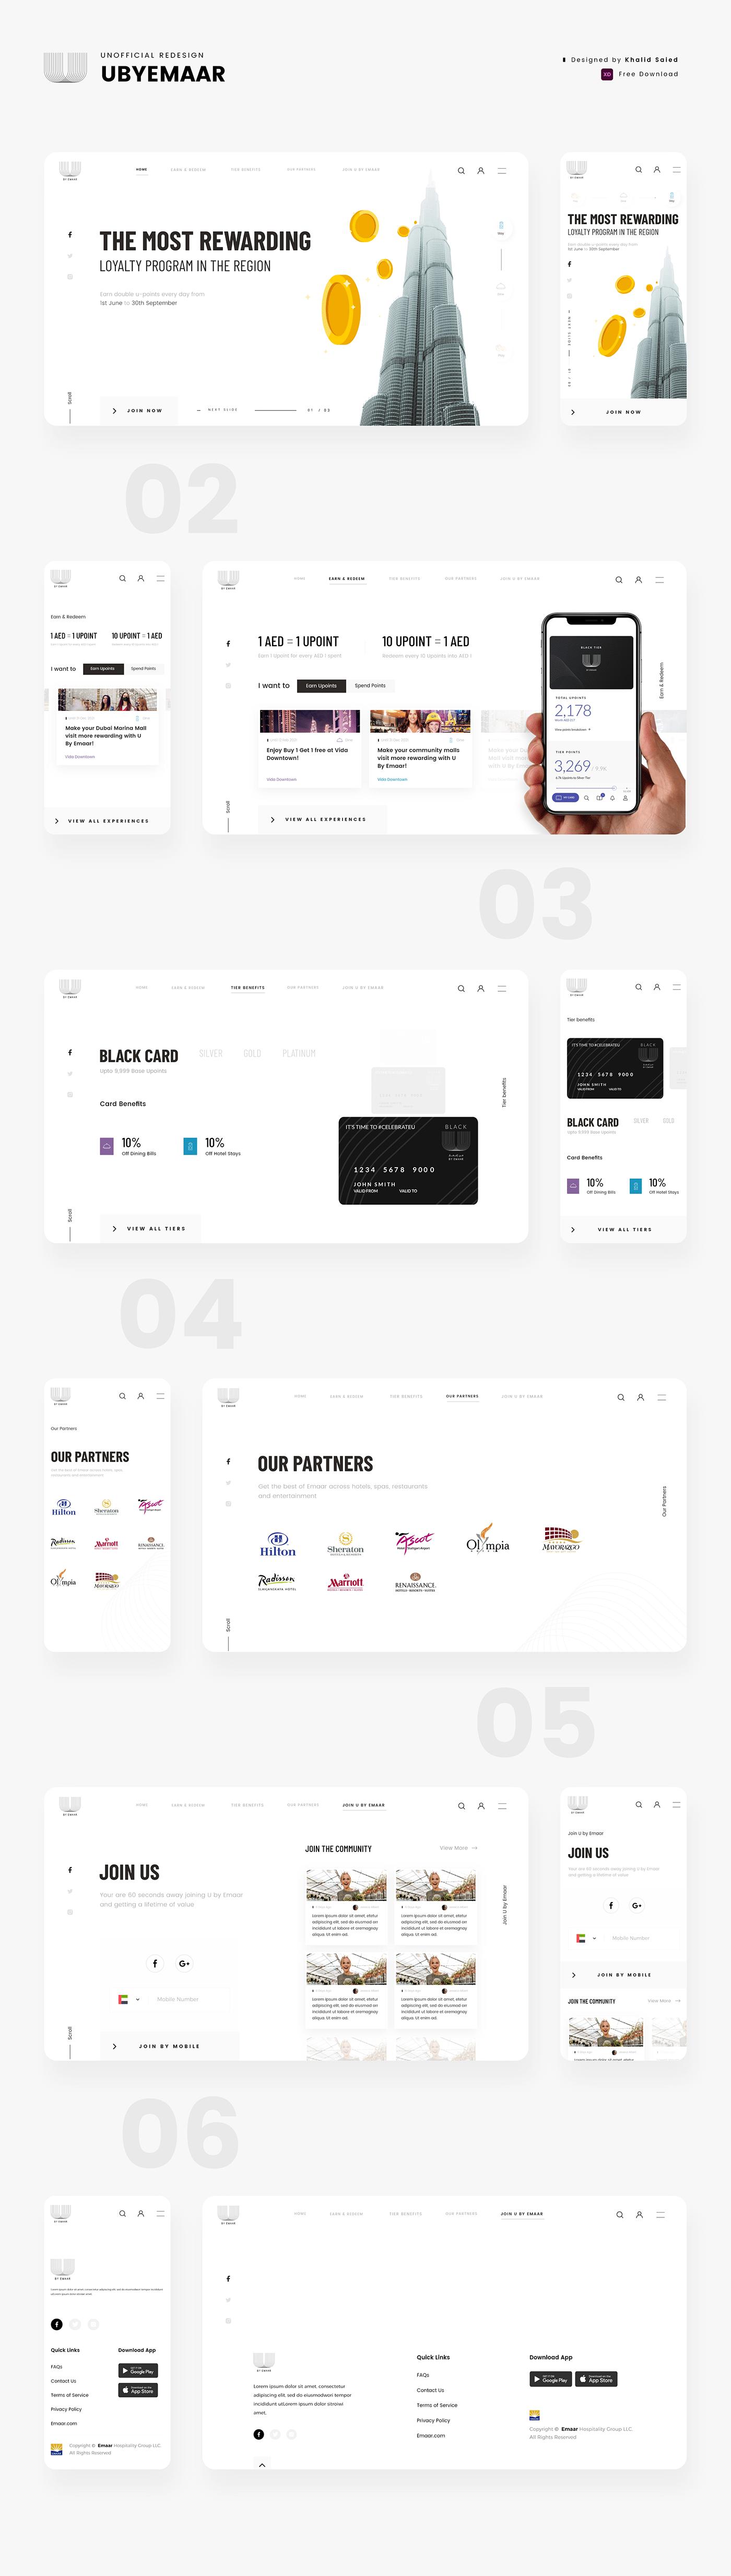 free adobe xd free download UbyEmaar web redesign